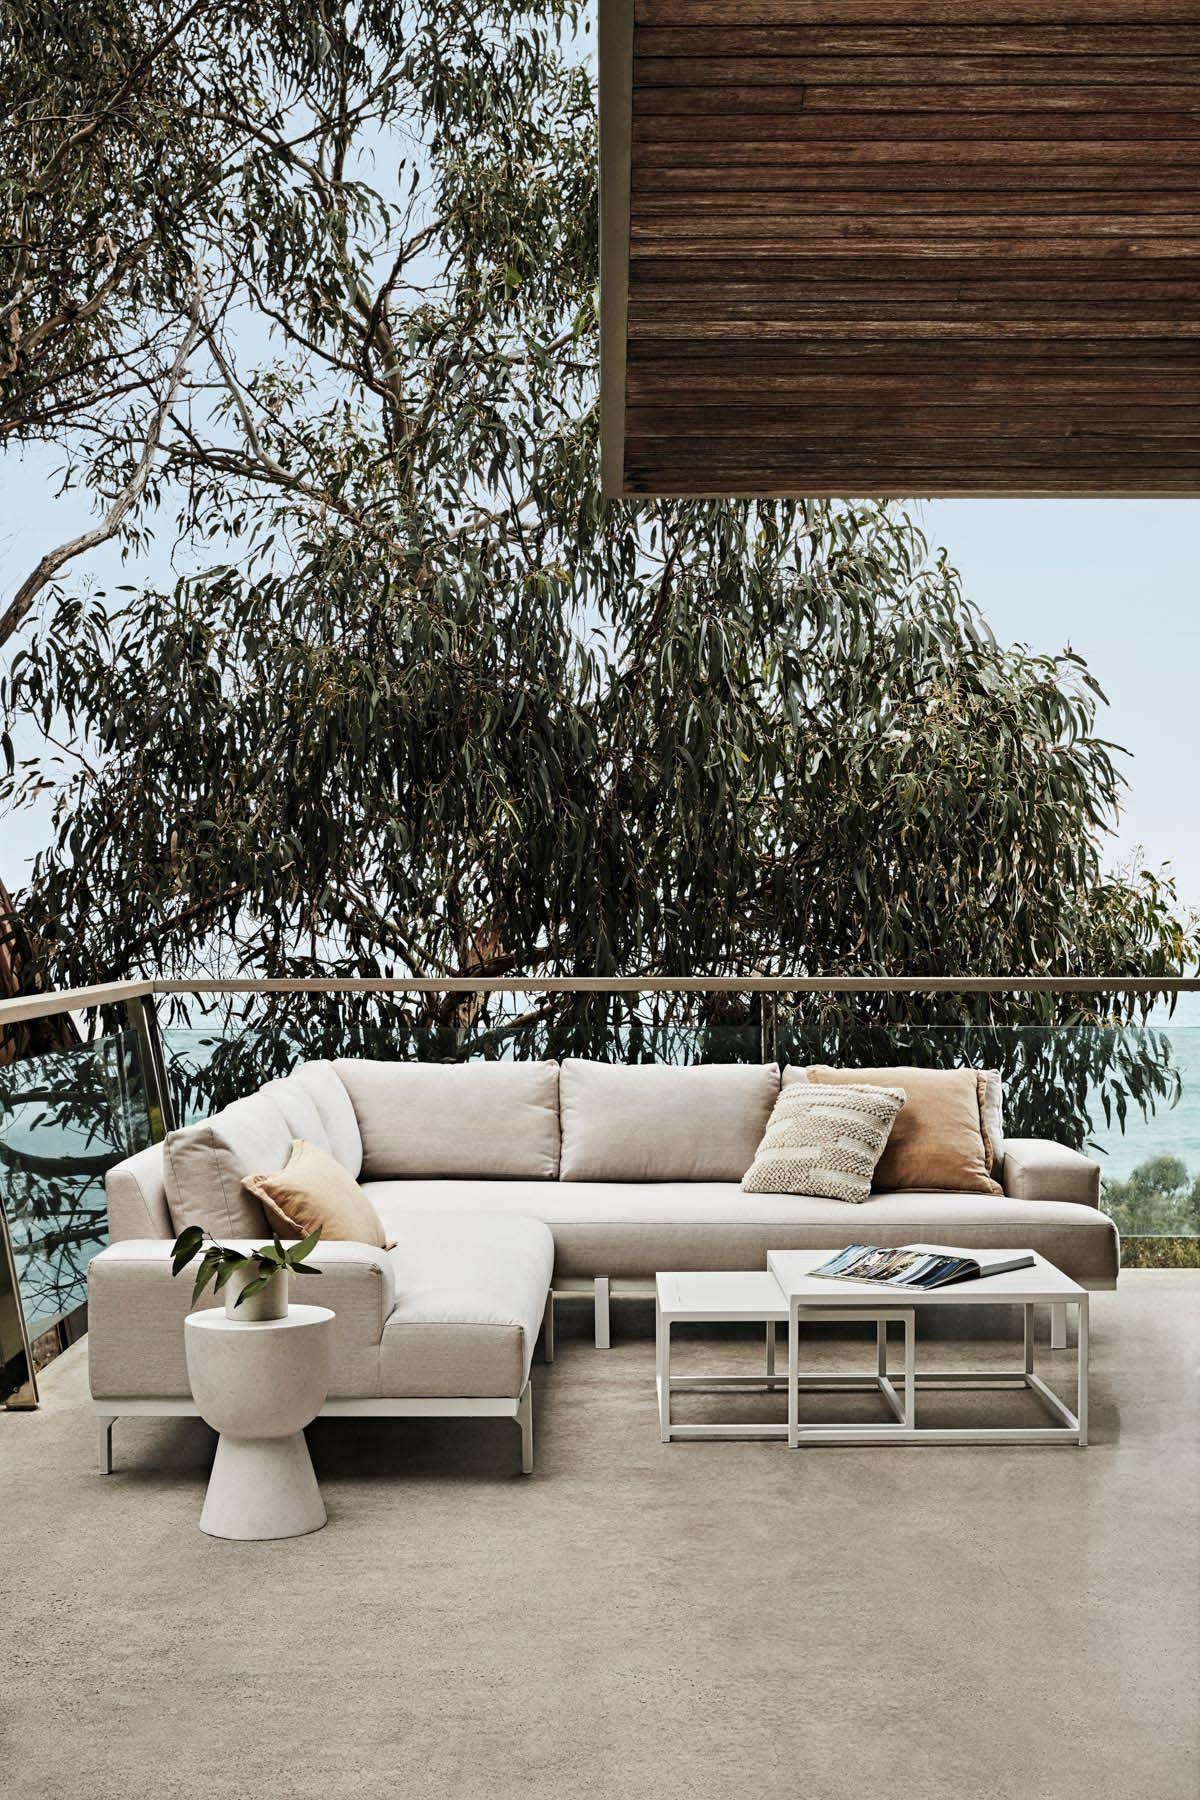 Furniture Gallery Sofas aruba-platform-two-seater-01